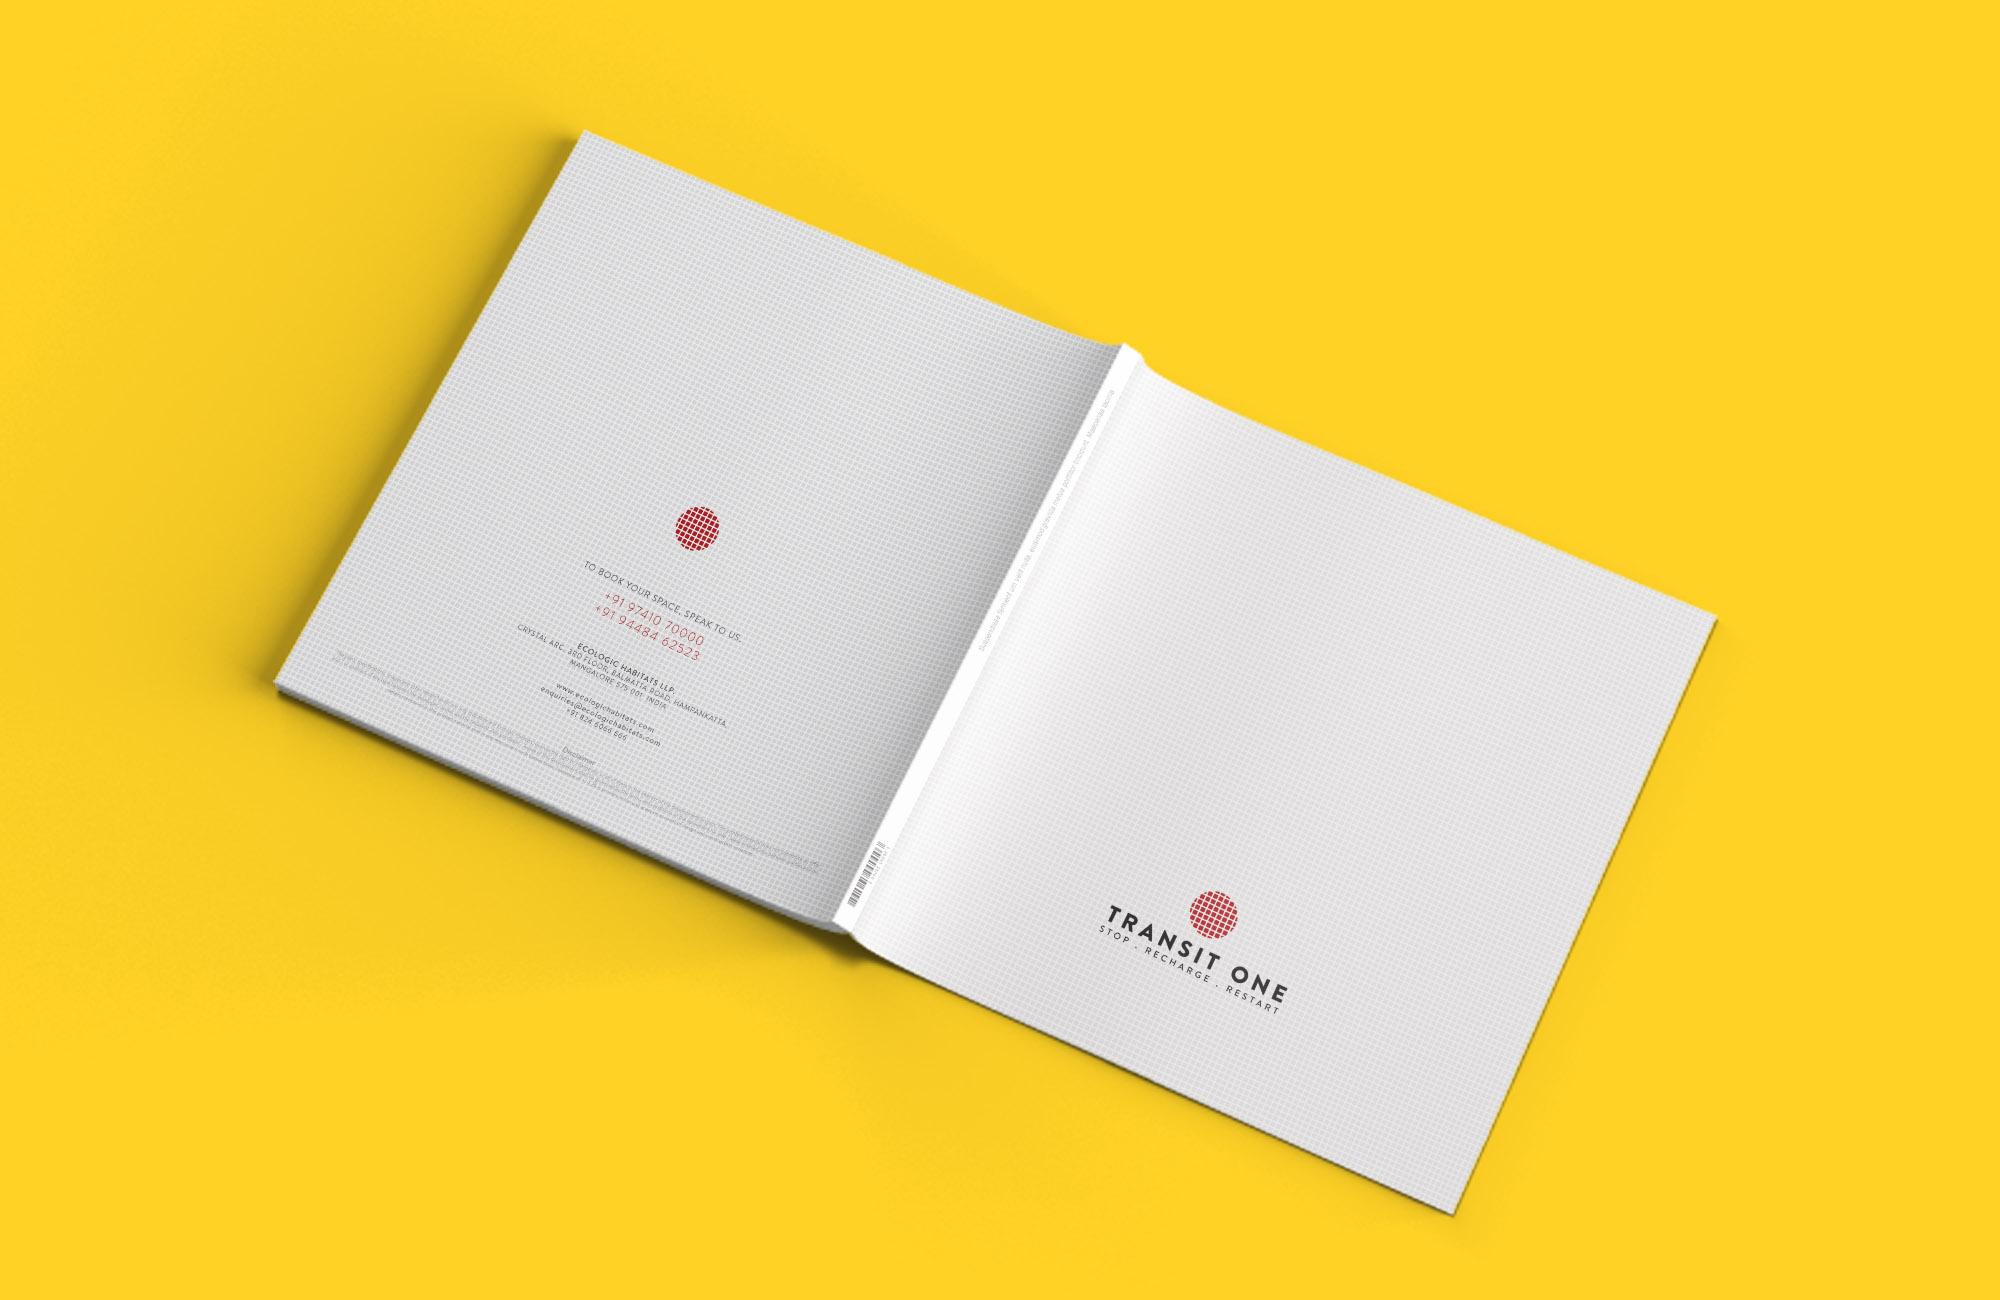 ecologic-habitats-brochuremockup-1-cover